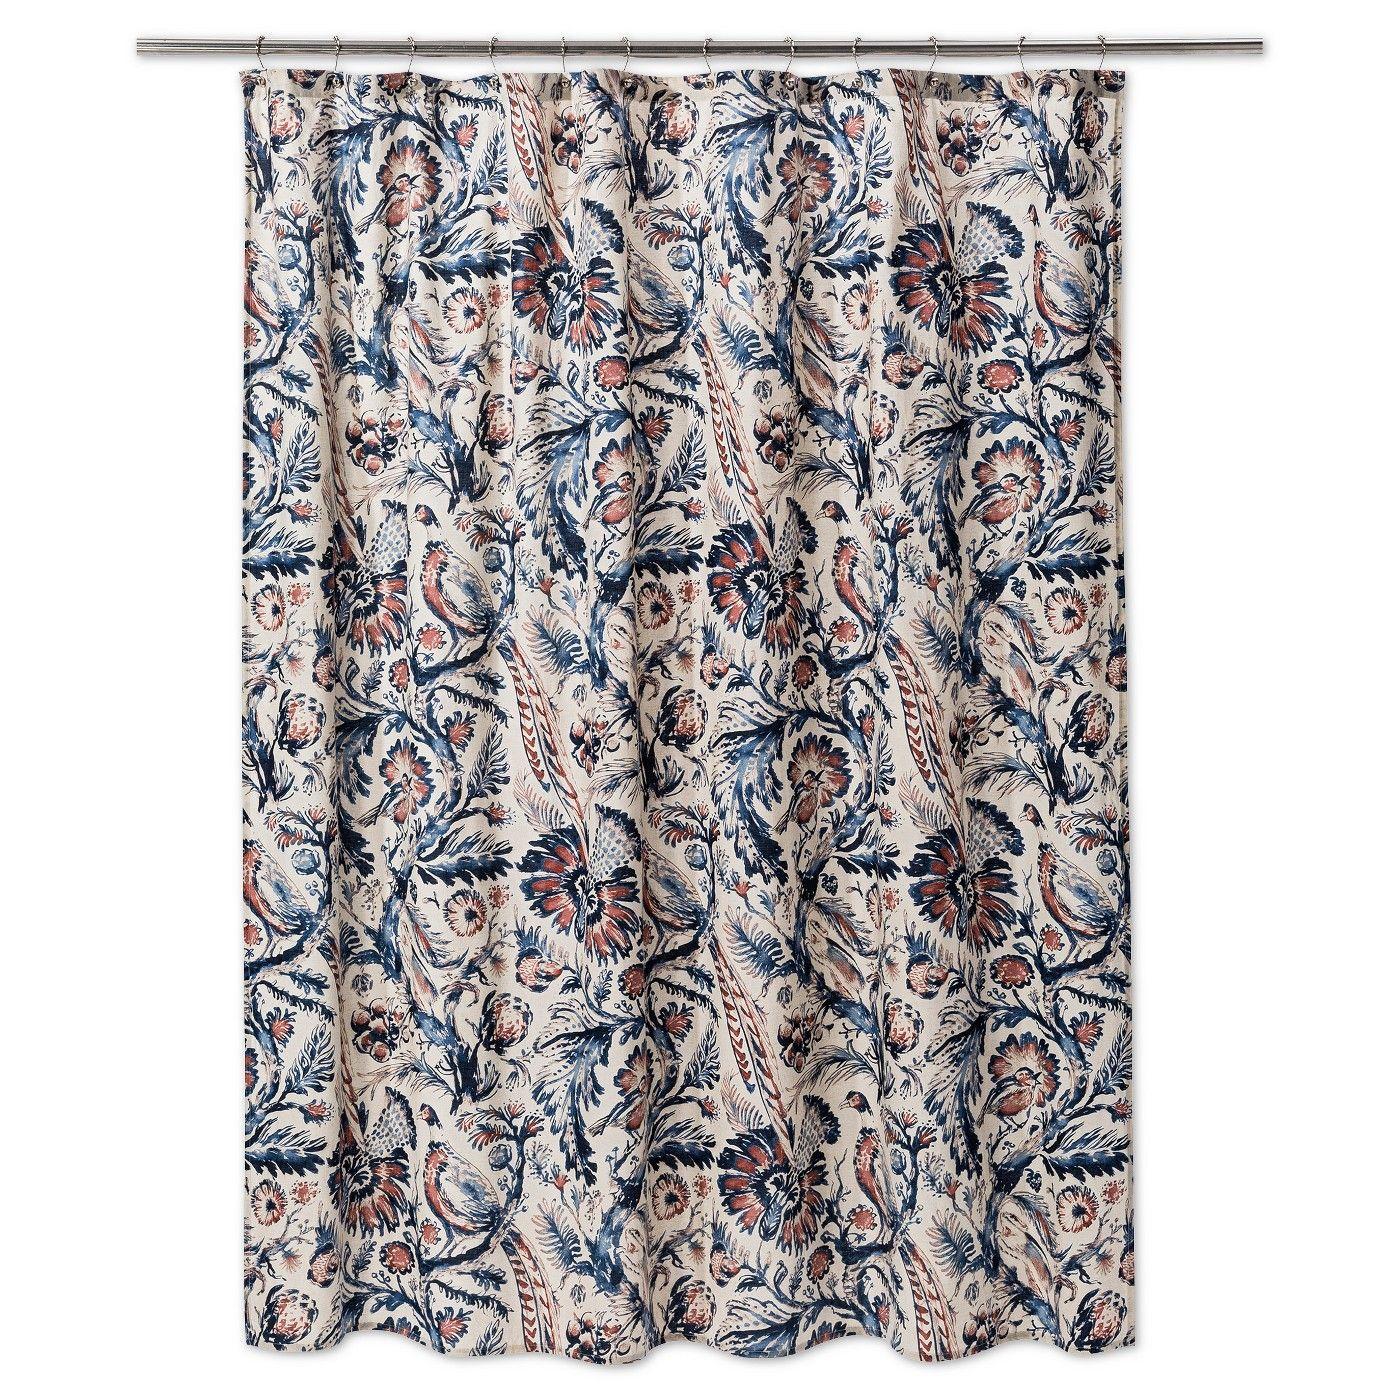 6ec0e6243f1e Floral Shower Curtain Xaviery Navy - Threshold™ - image 1 of 1